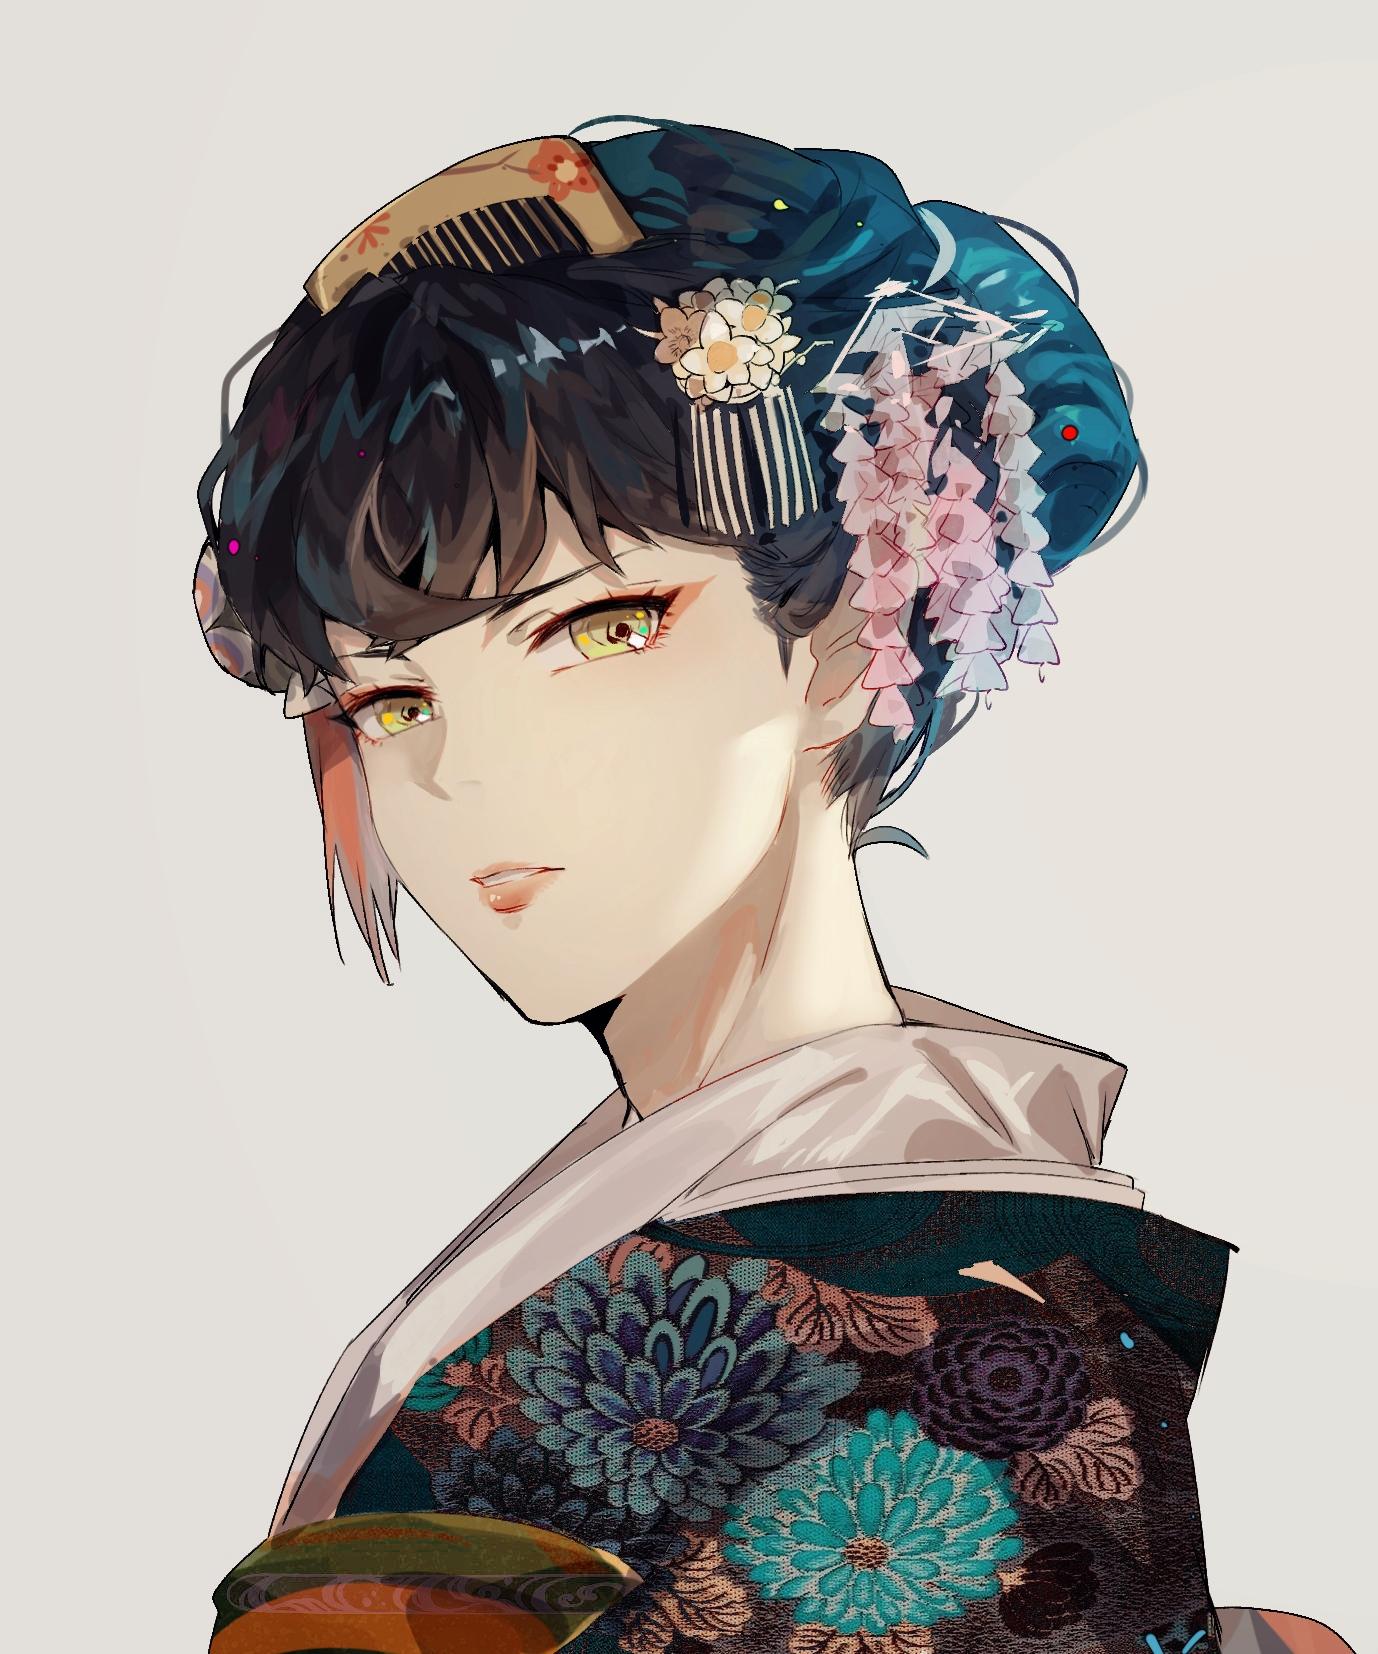 Wallpaper : Kimetsu No Yaiba, Anime Boys, Fan Art, Digital